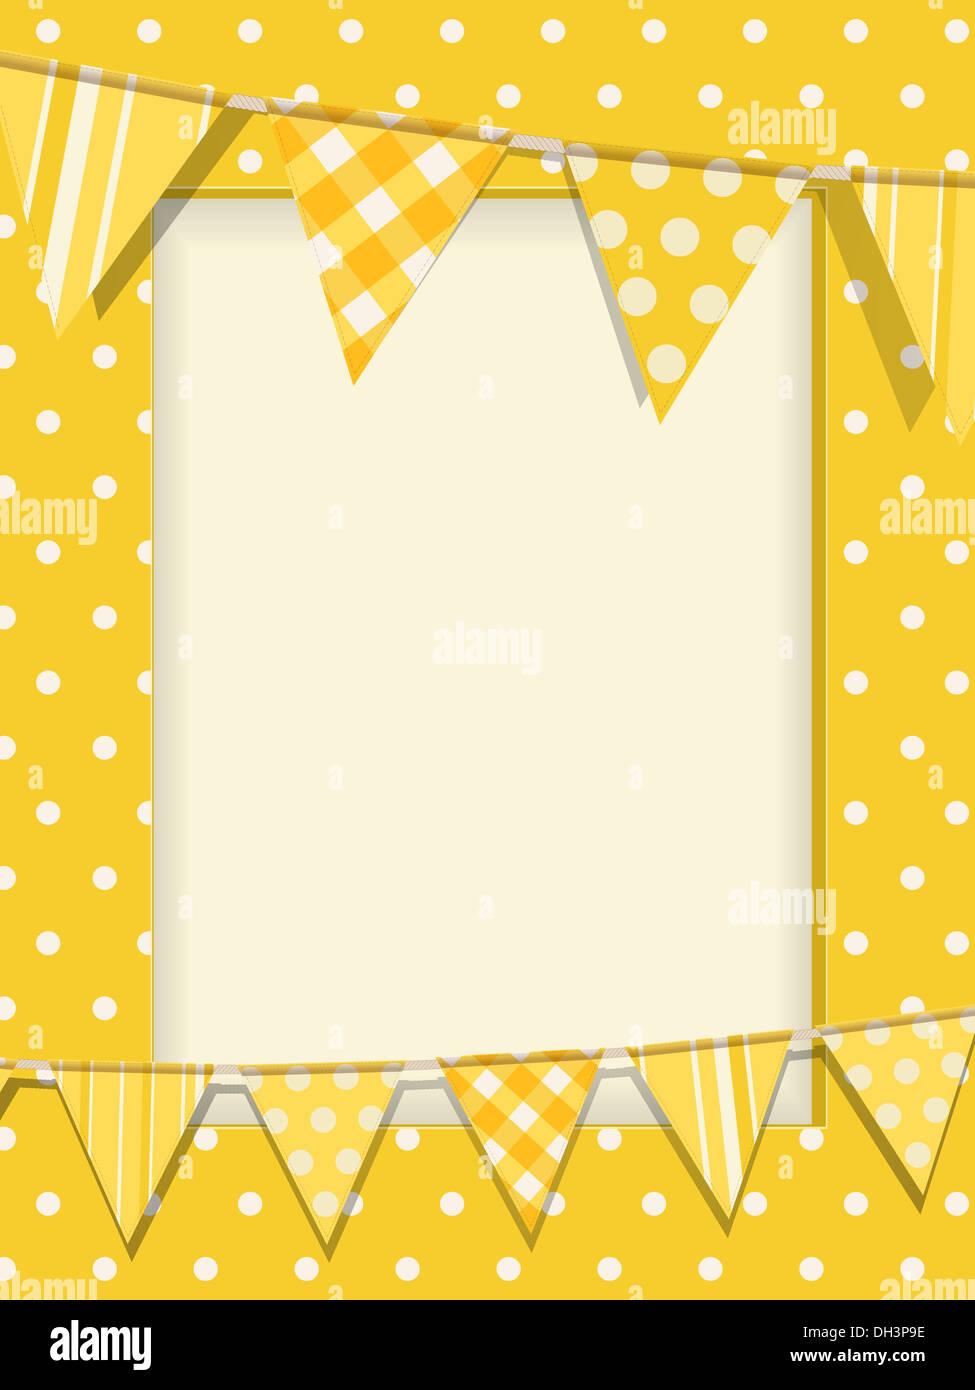 Bunting on a yellow polka dot frame Stock Photo: 62163626 - Alamy